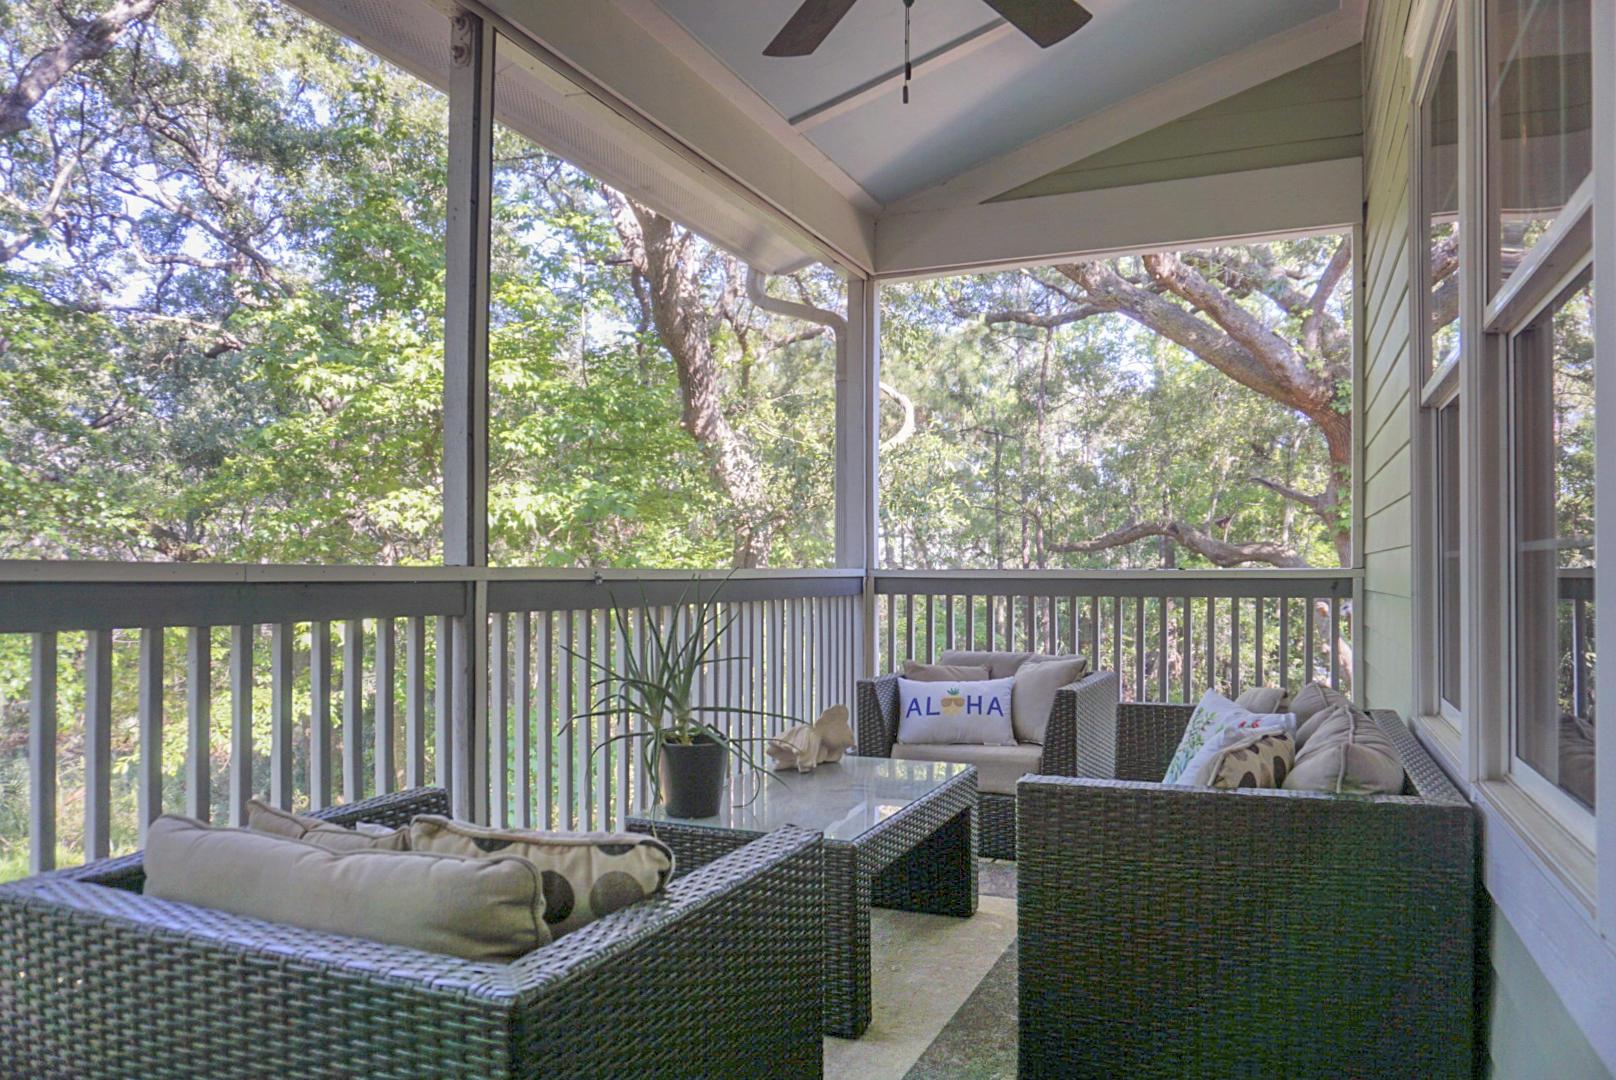 Etiwan Pointe Homes For Sale - 269 Etiwan Pointe, Mount Pleasant, SC - 53